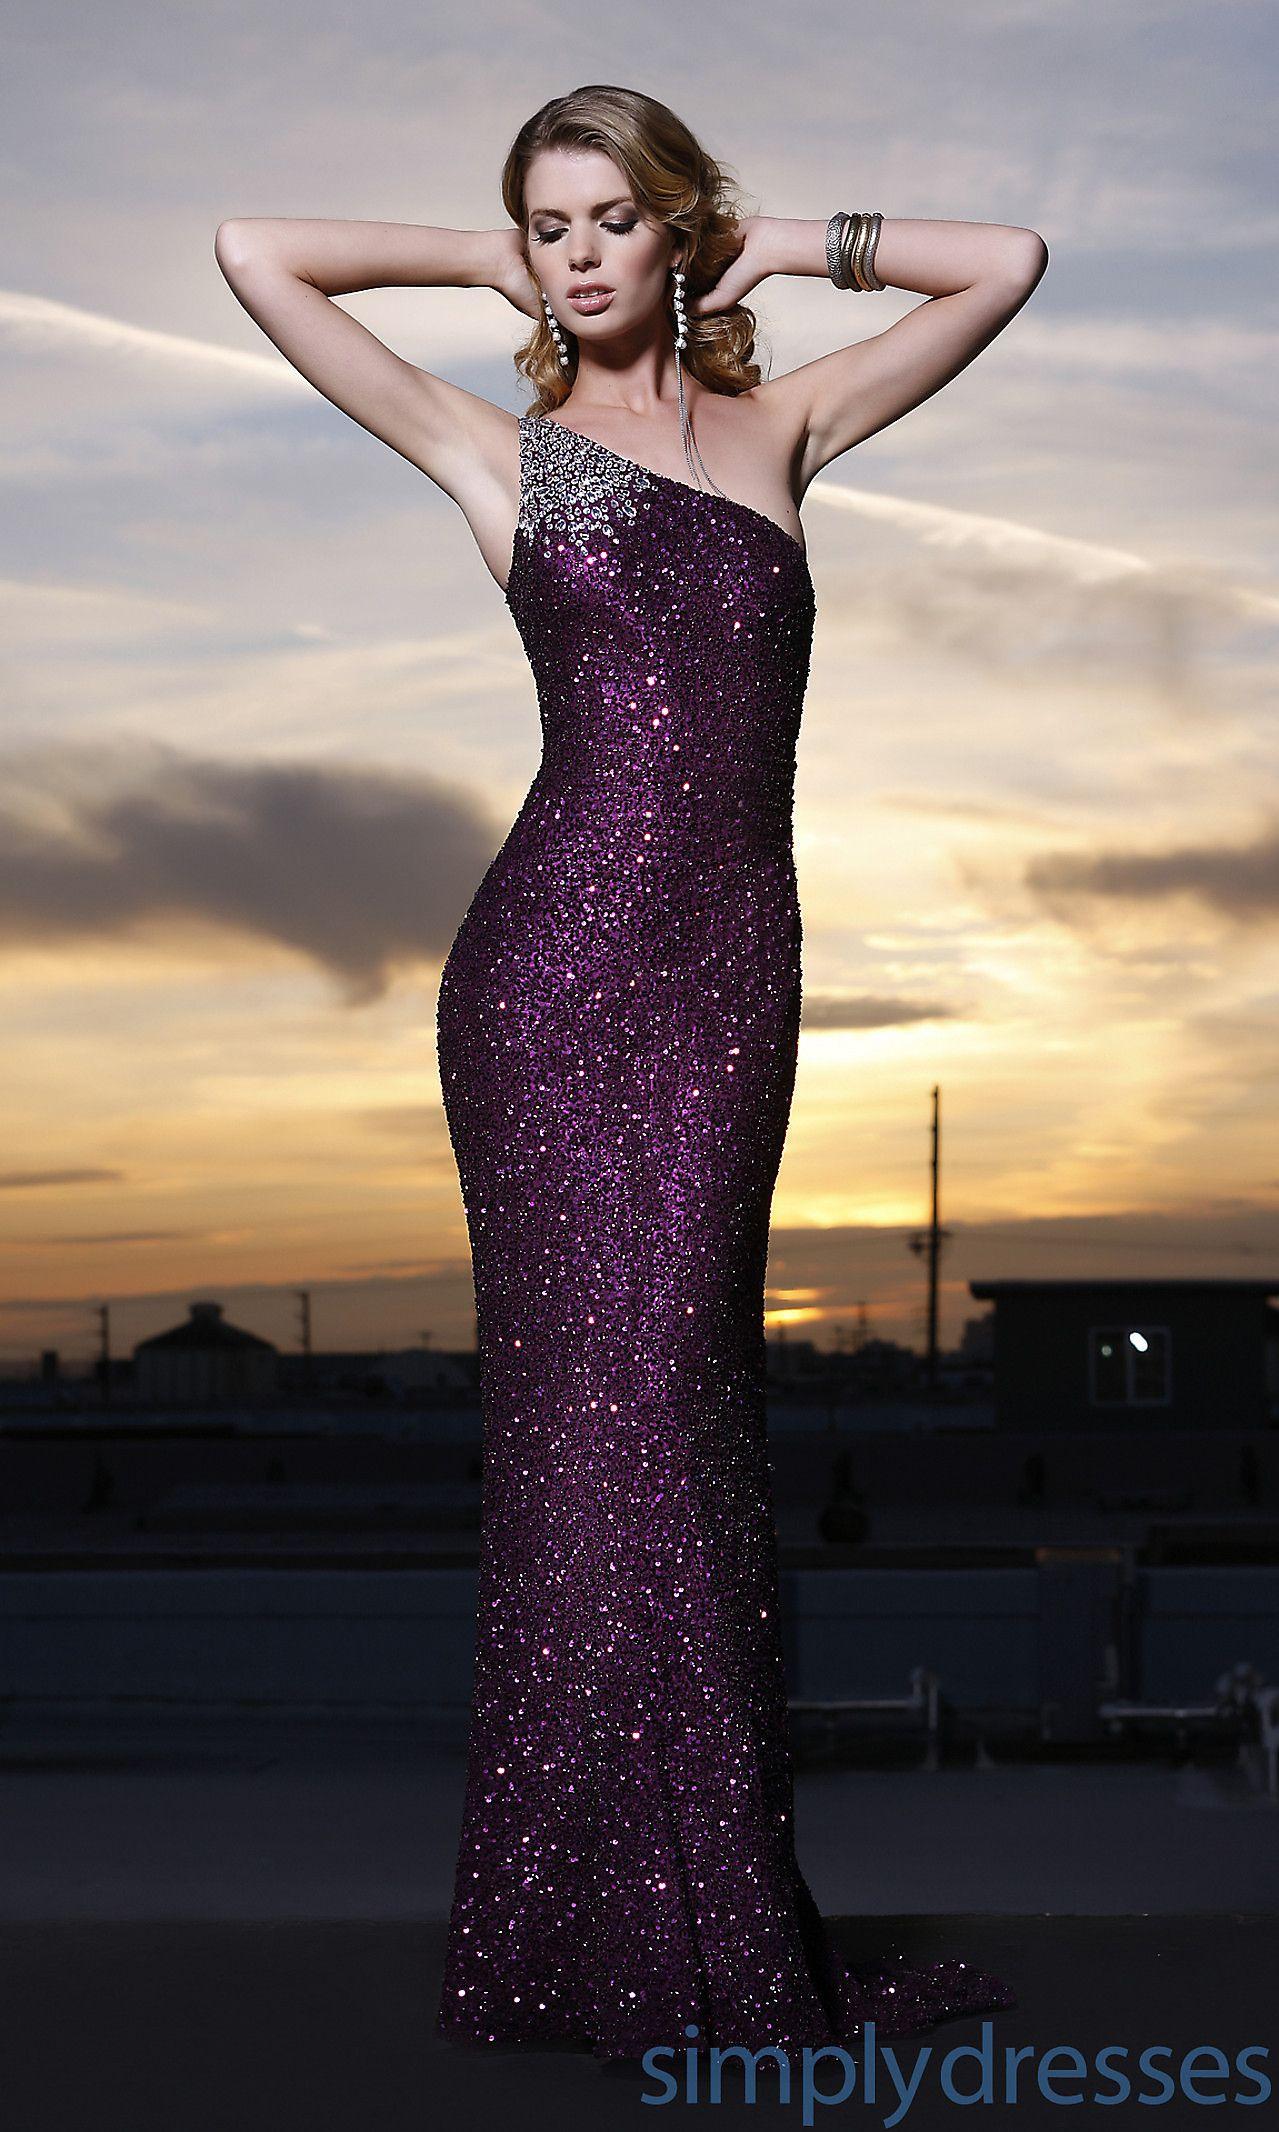 Shoulder One Prom Dress.purple.sequin